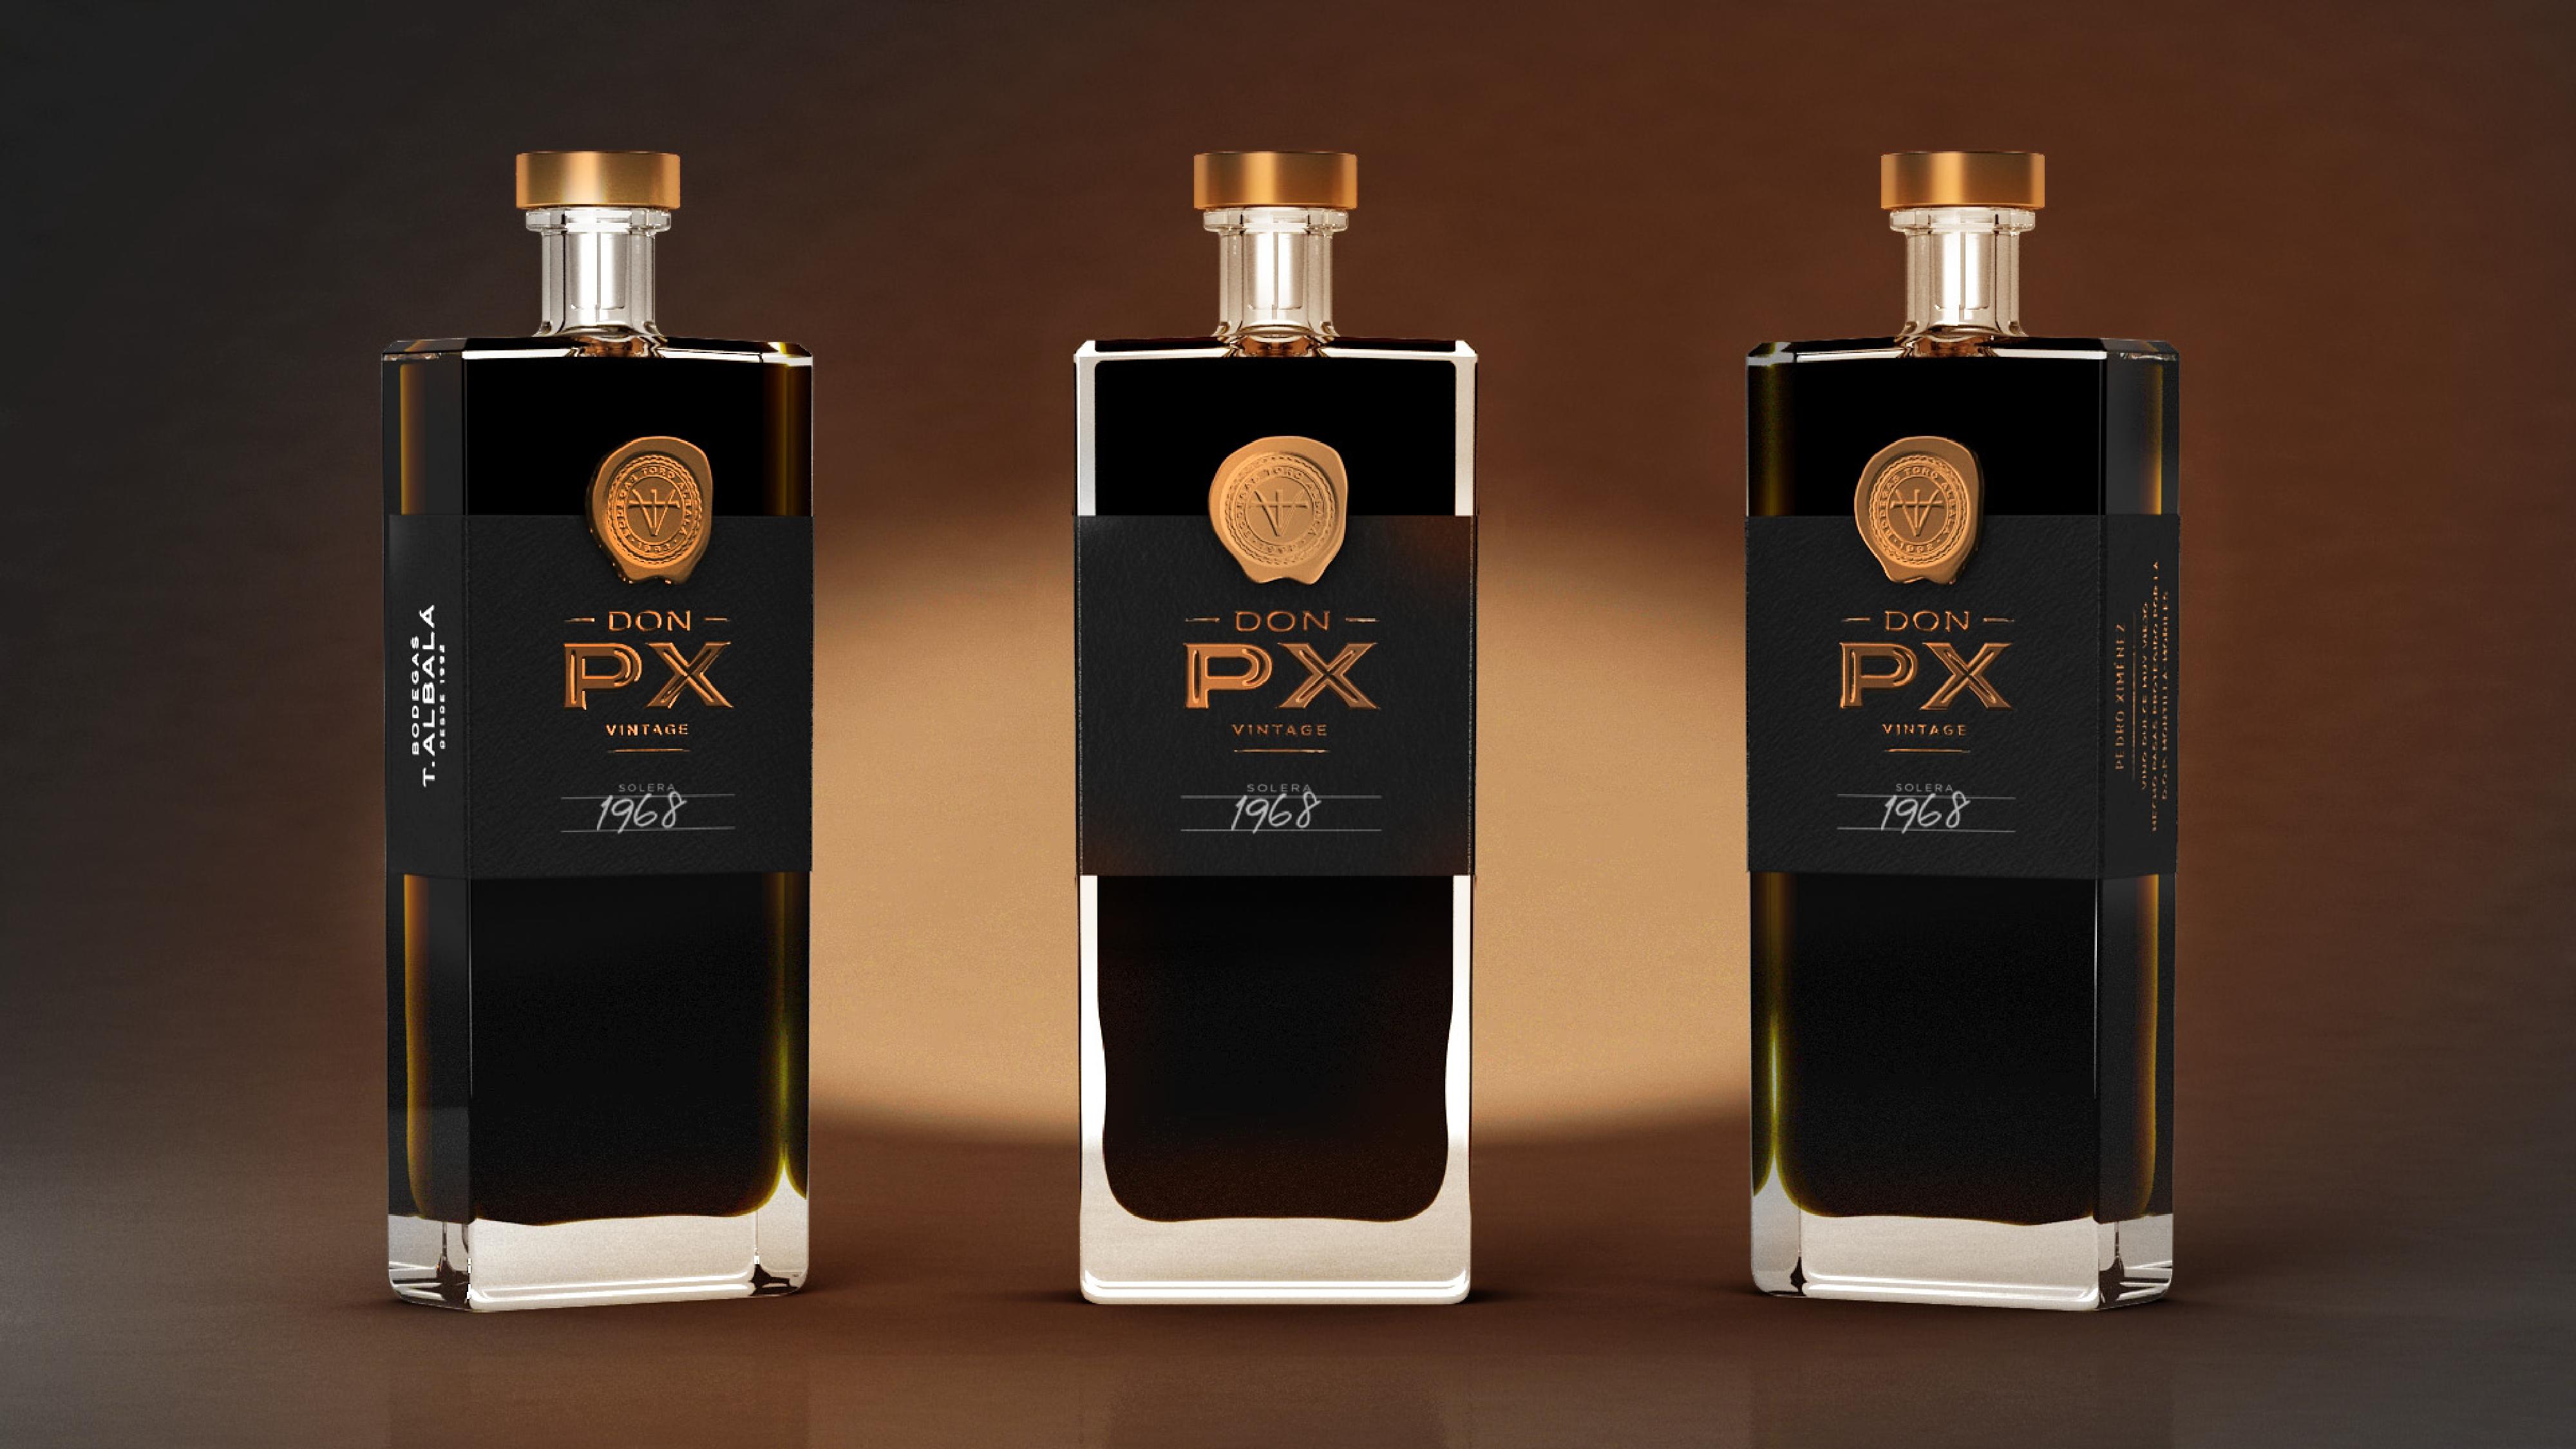 Toro Albalá rediseña las petacas de su icónico vino Don PX | Luxury Spain